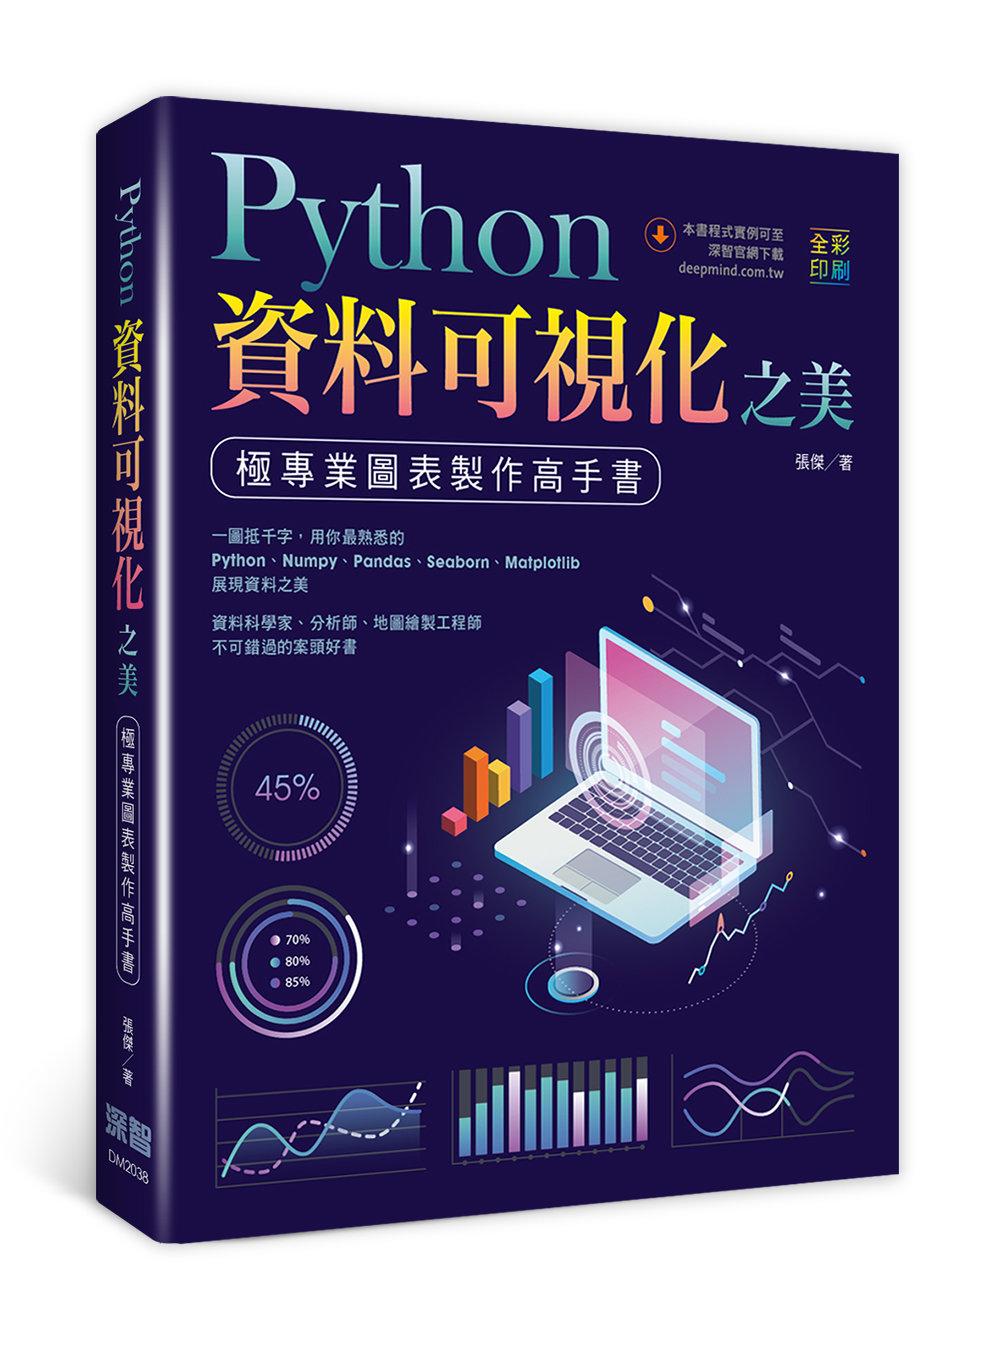 Python 資料可視化之美:極專業圖表製作高手書 (全彩印刷)-preview-1